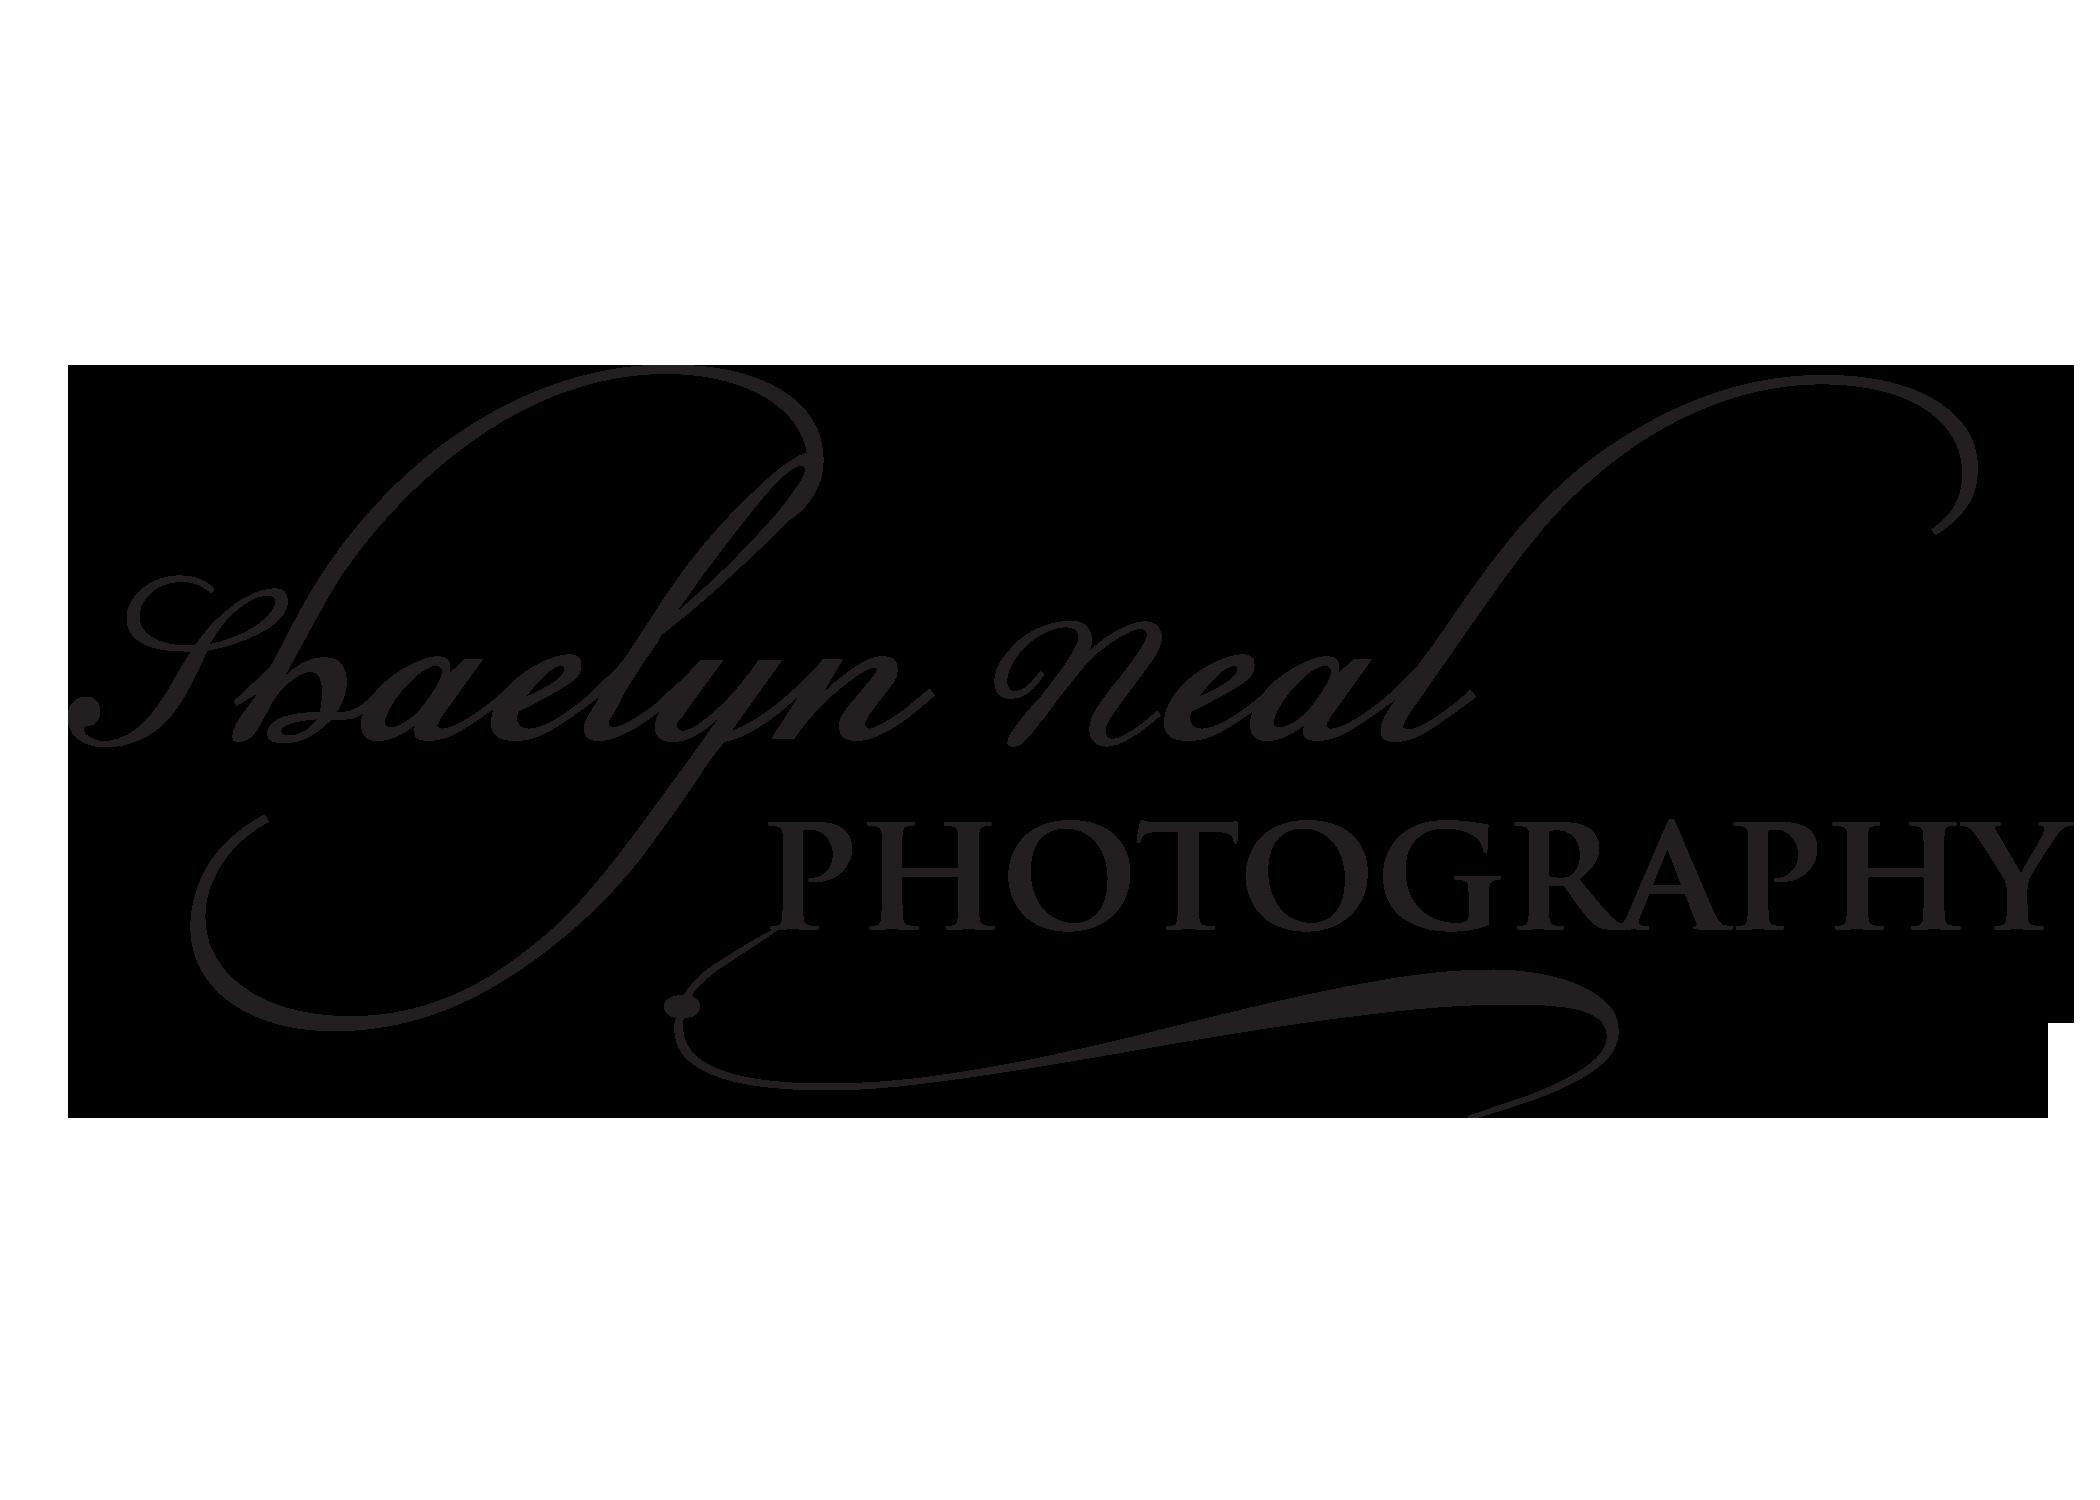 Shaelyn Neal Photography